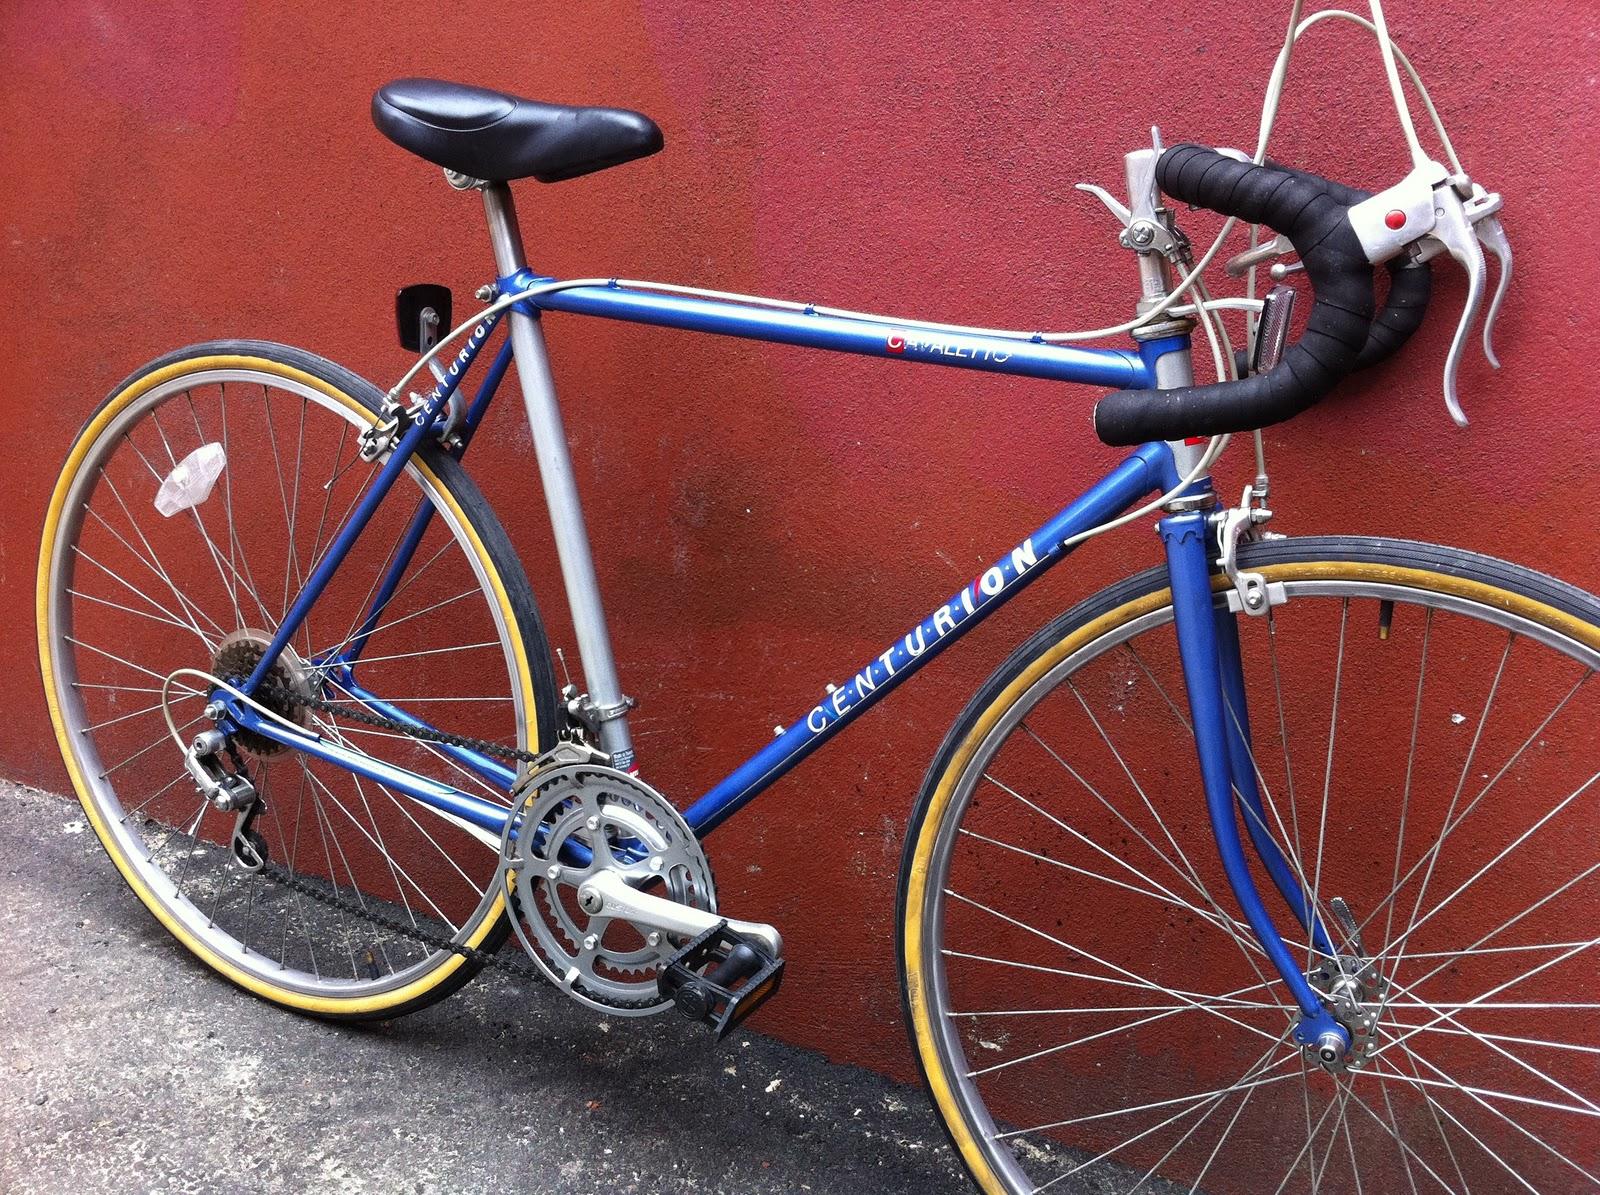 bike boom refurbished bikes centurion cavaletto. Black Bedroom Furniture Sets. Home Design Ideas